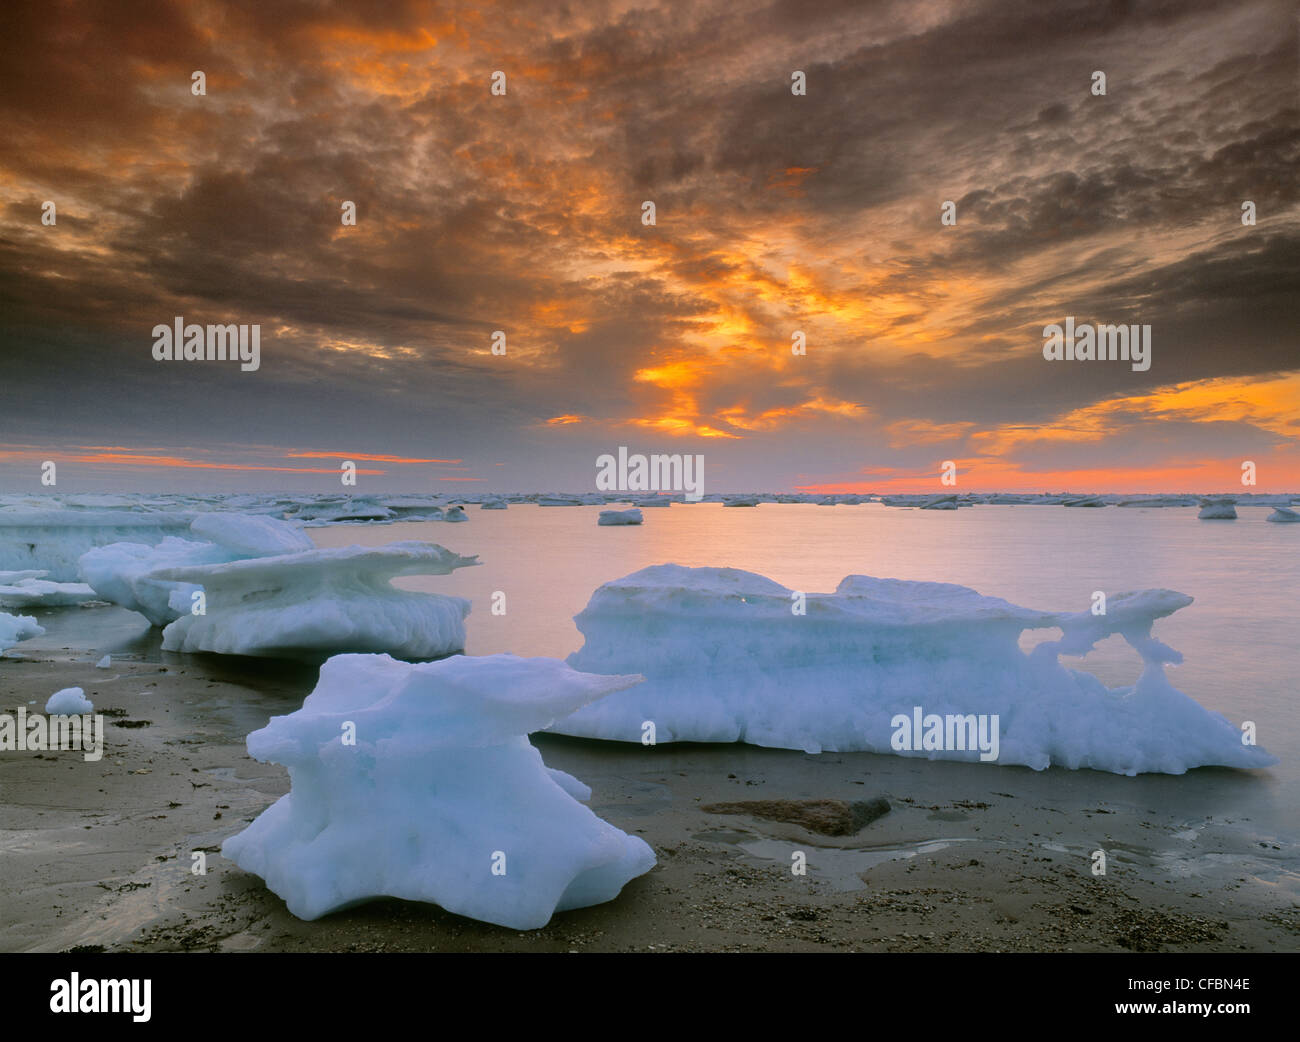 Icebergs in Hudson's Bay, Churchill, Manitoba, Canada - Stock Image